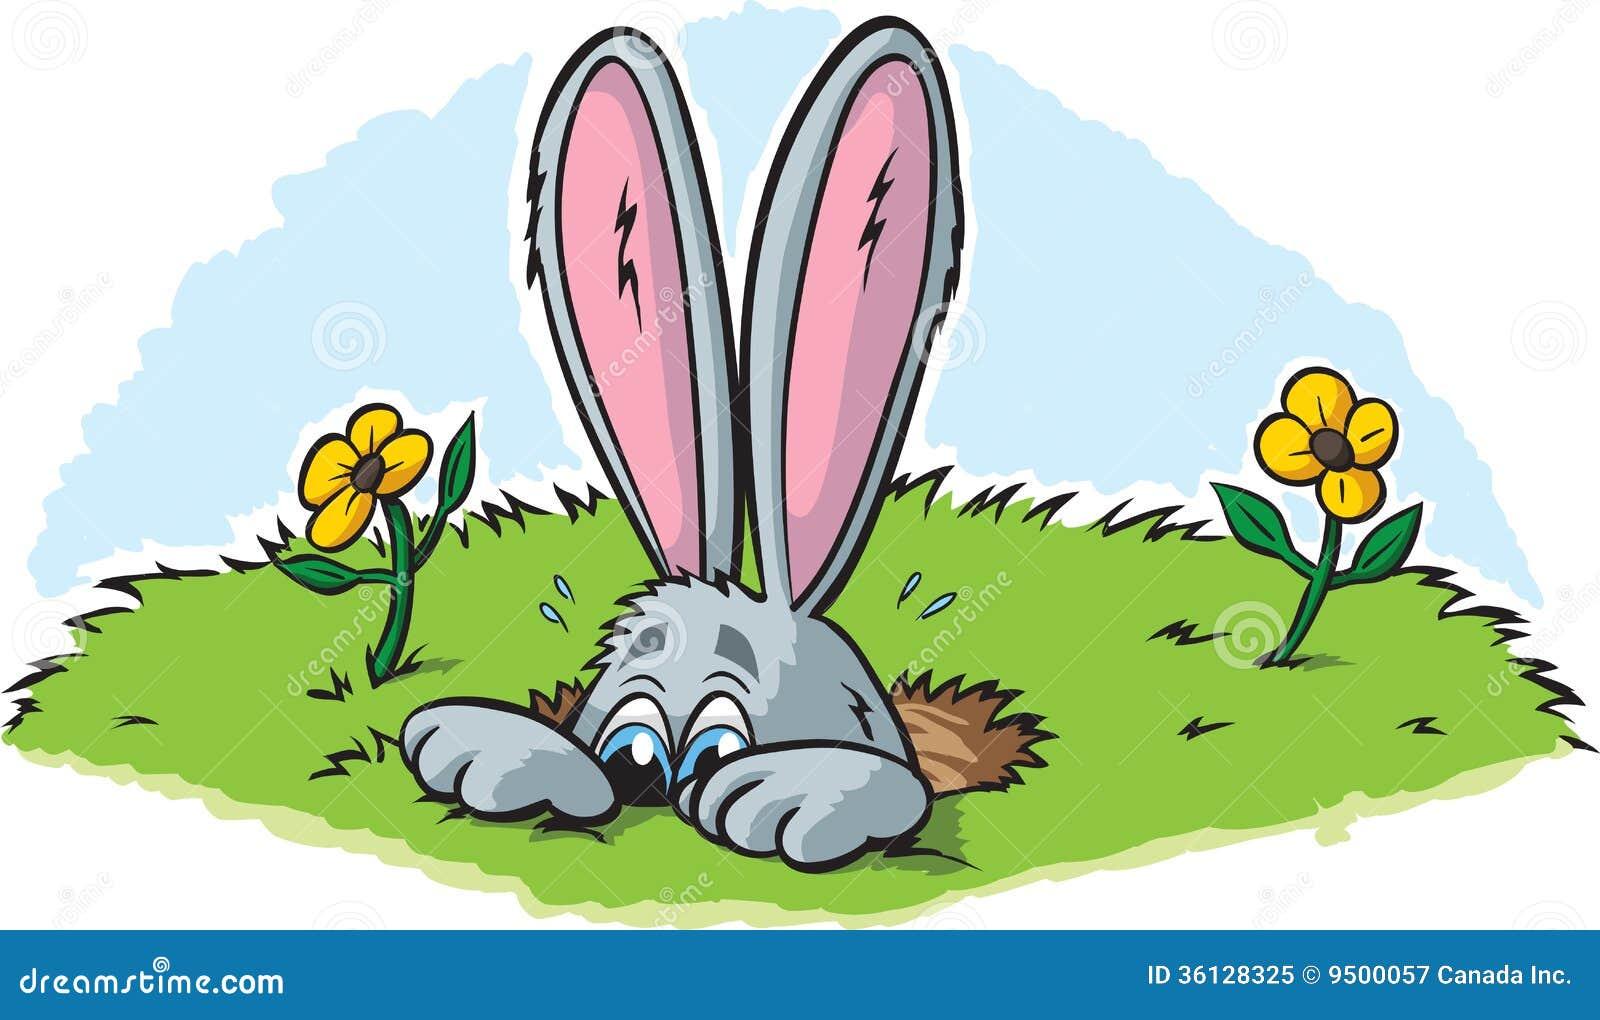 Rabbit burrow clipart - photo#9